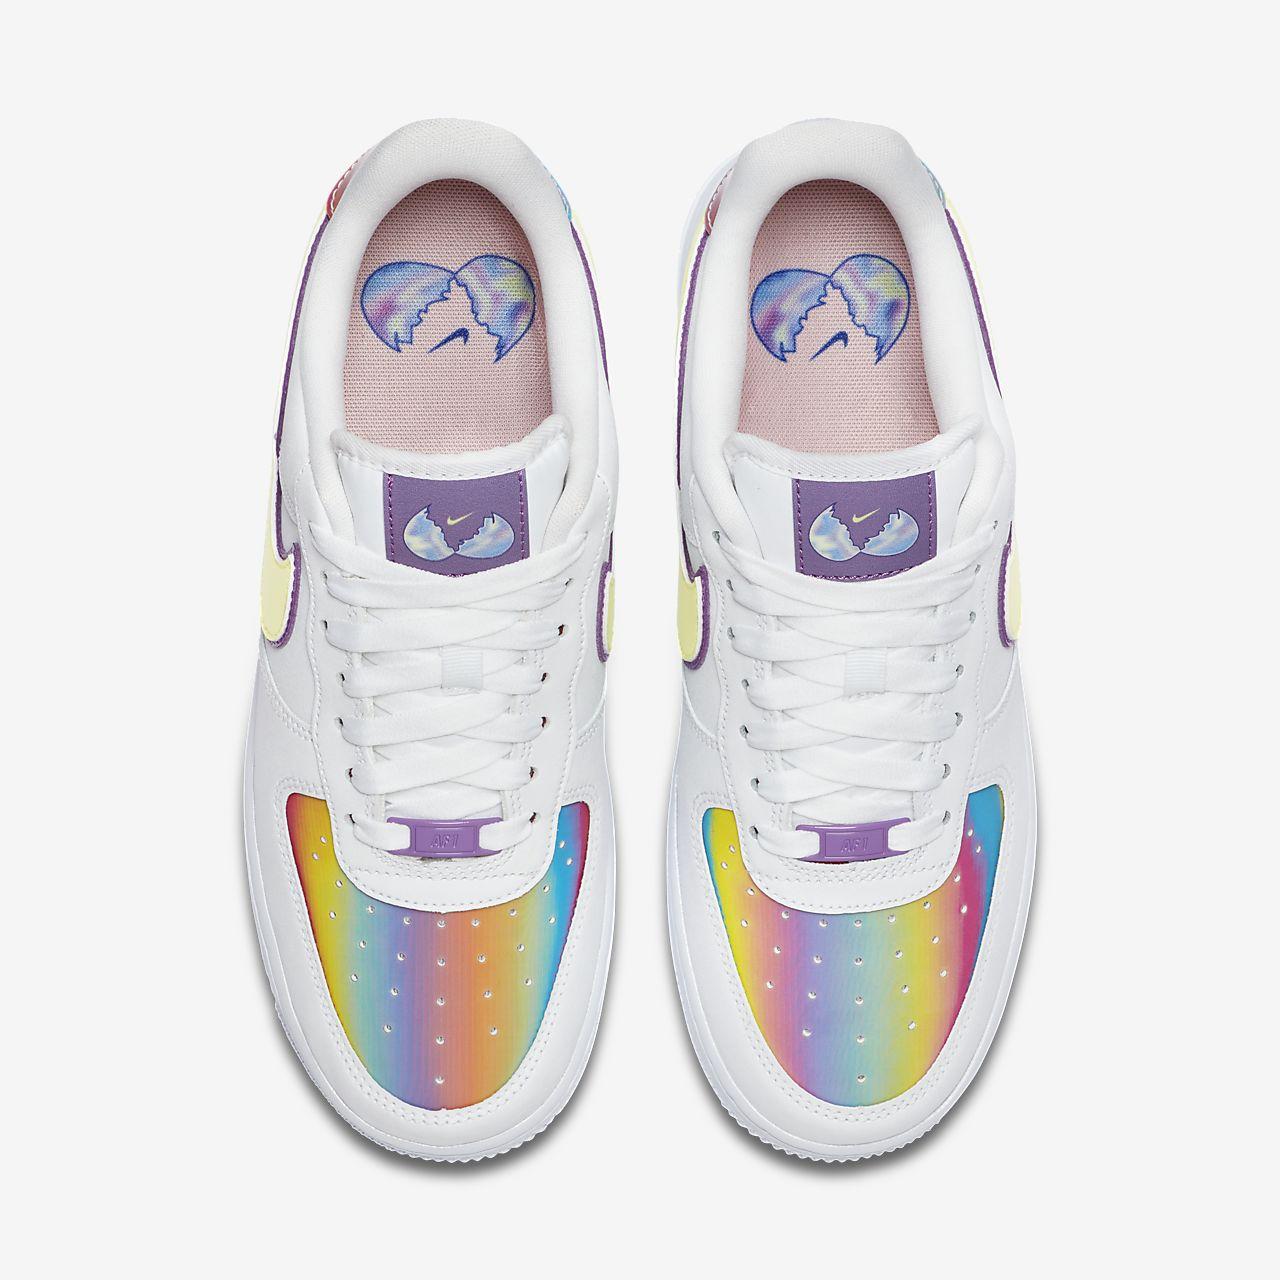 Calzado para mujer Nike Air Force 1 Easter